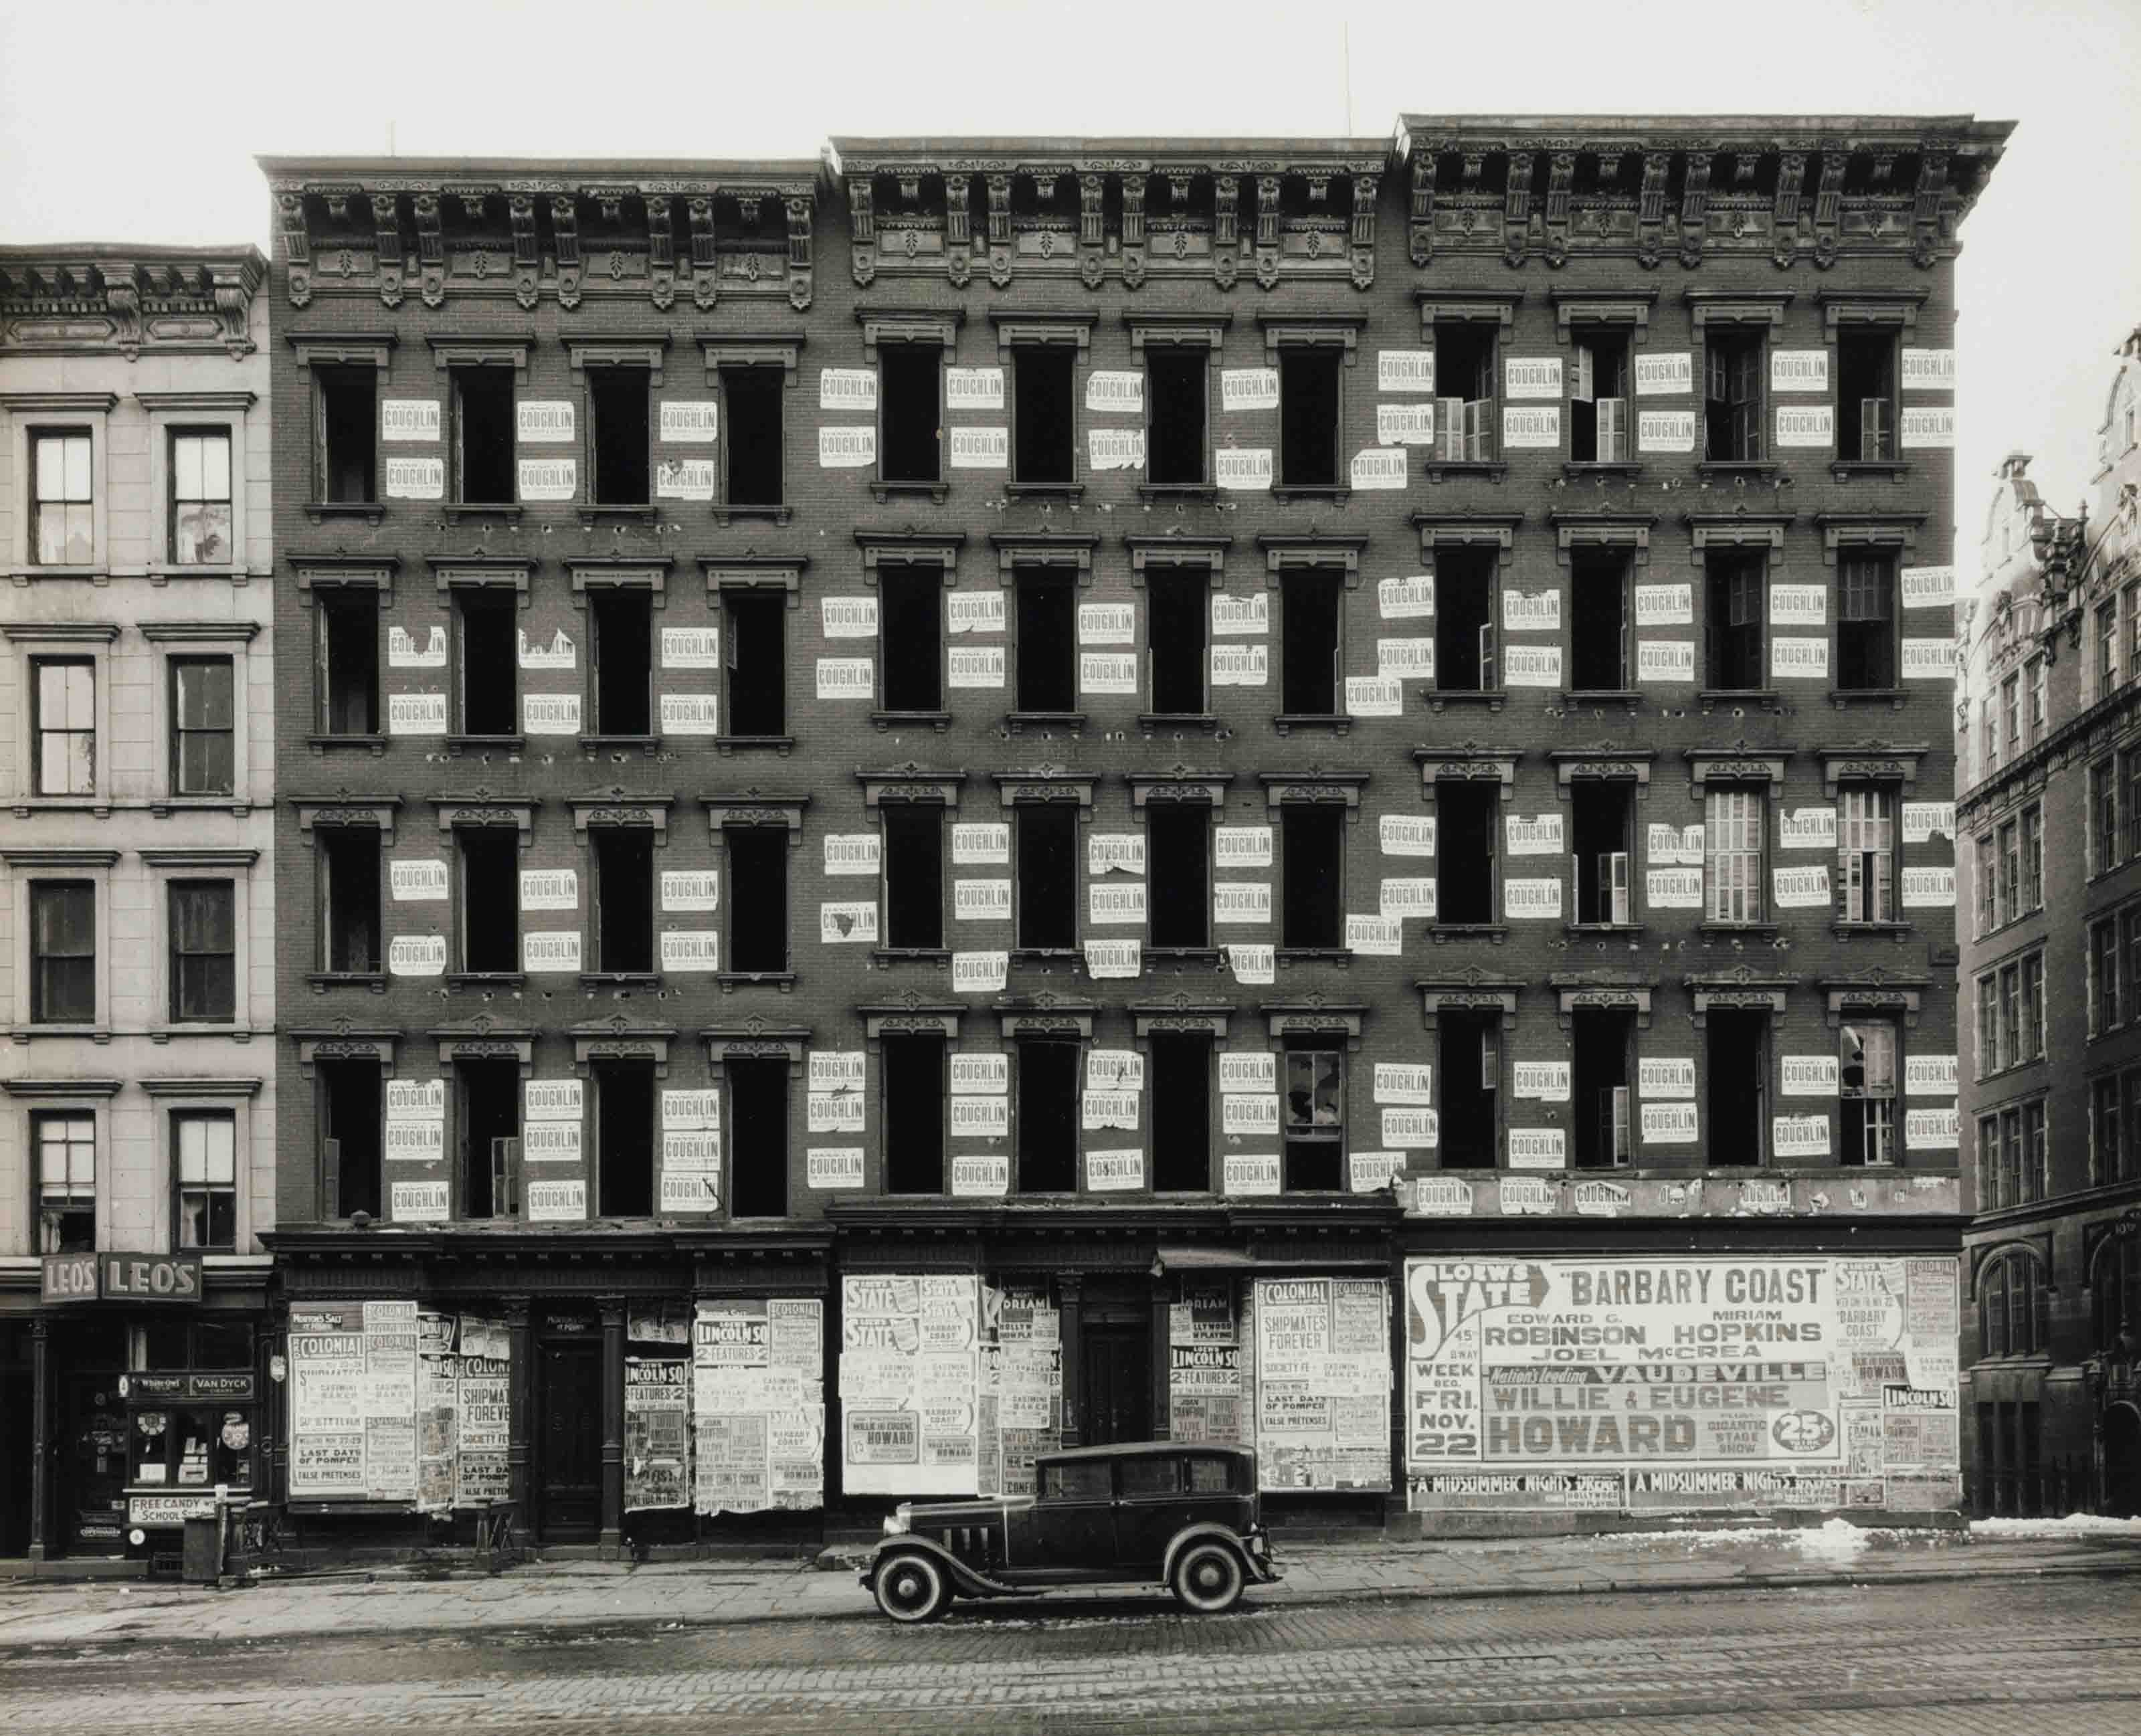 New York, c. 1935